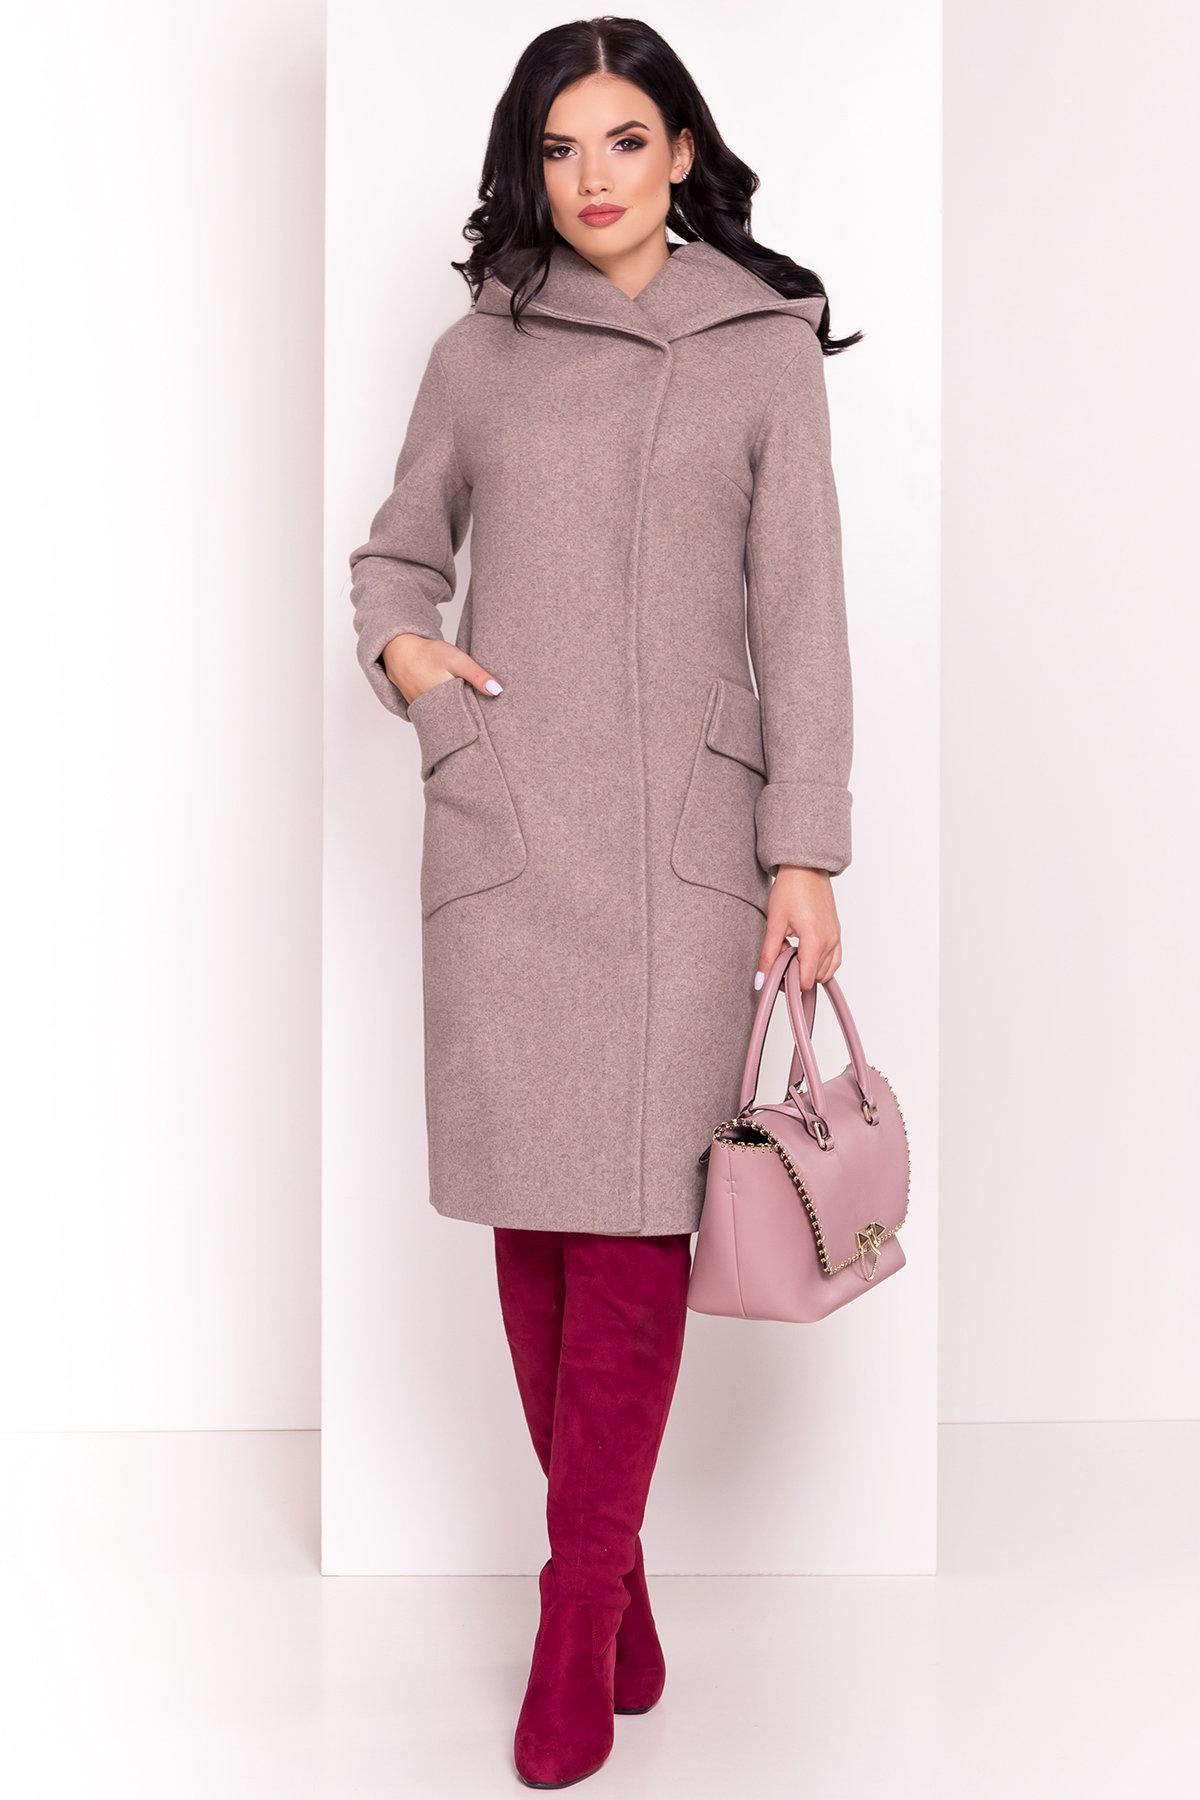 Пальто Анджи 5381 Цвет: Бежевый 10